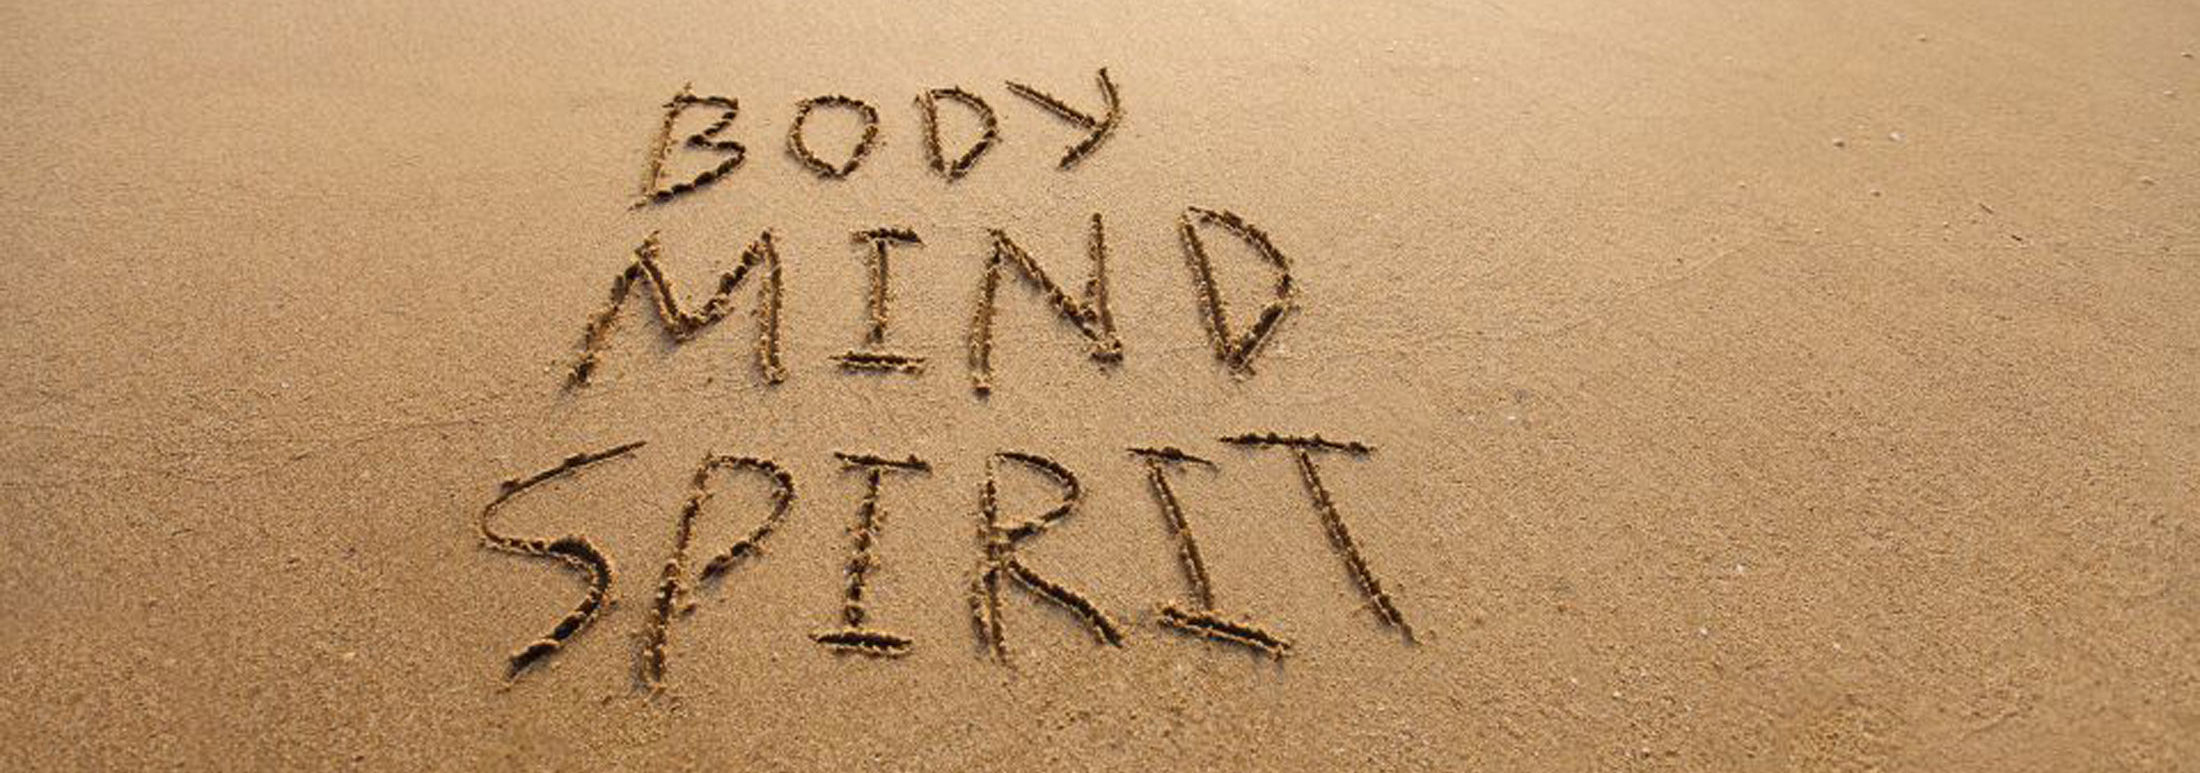 Body, mind, spirit hos Indre ro Odense